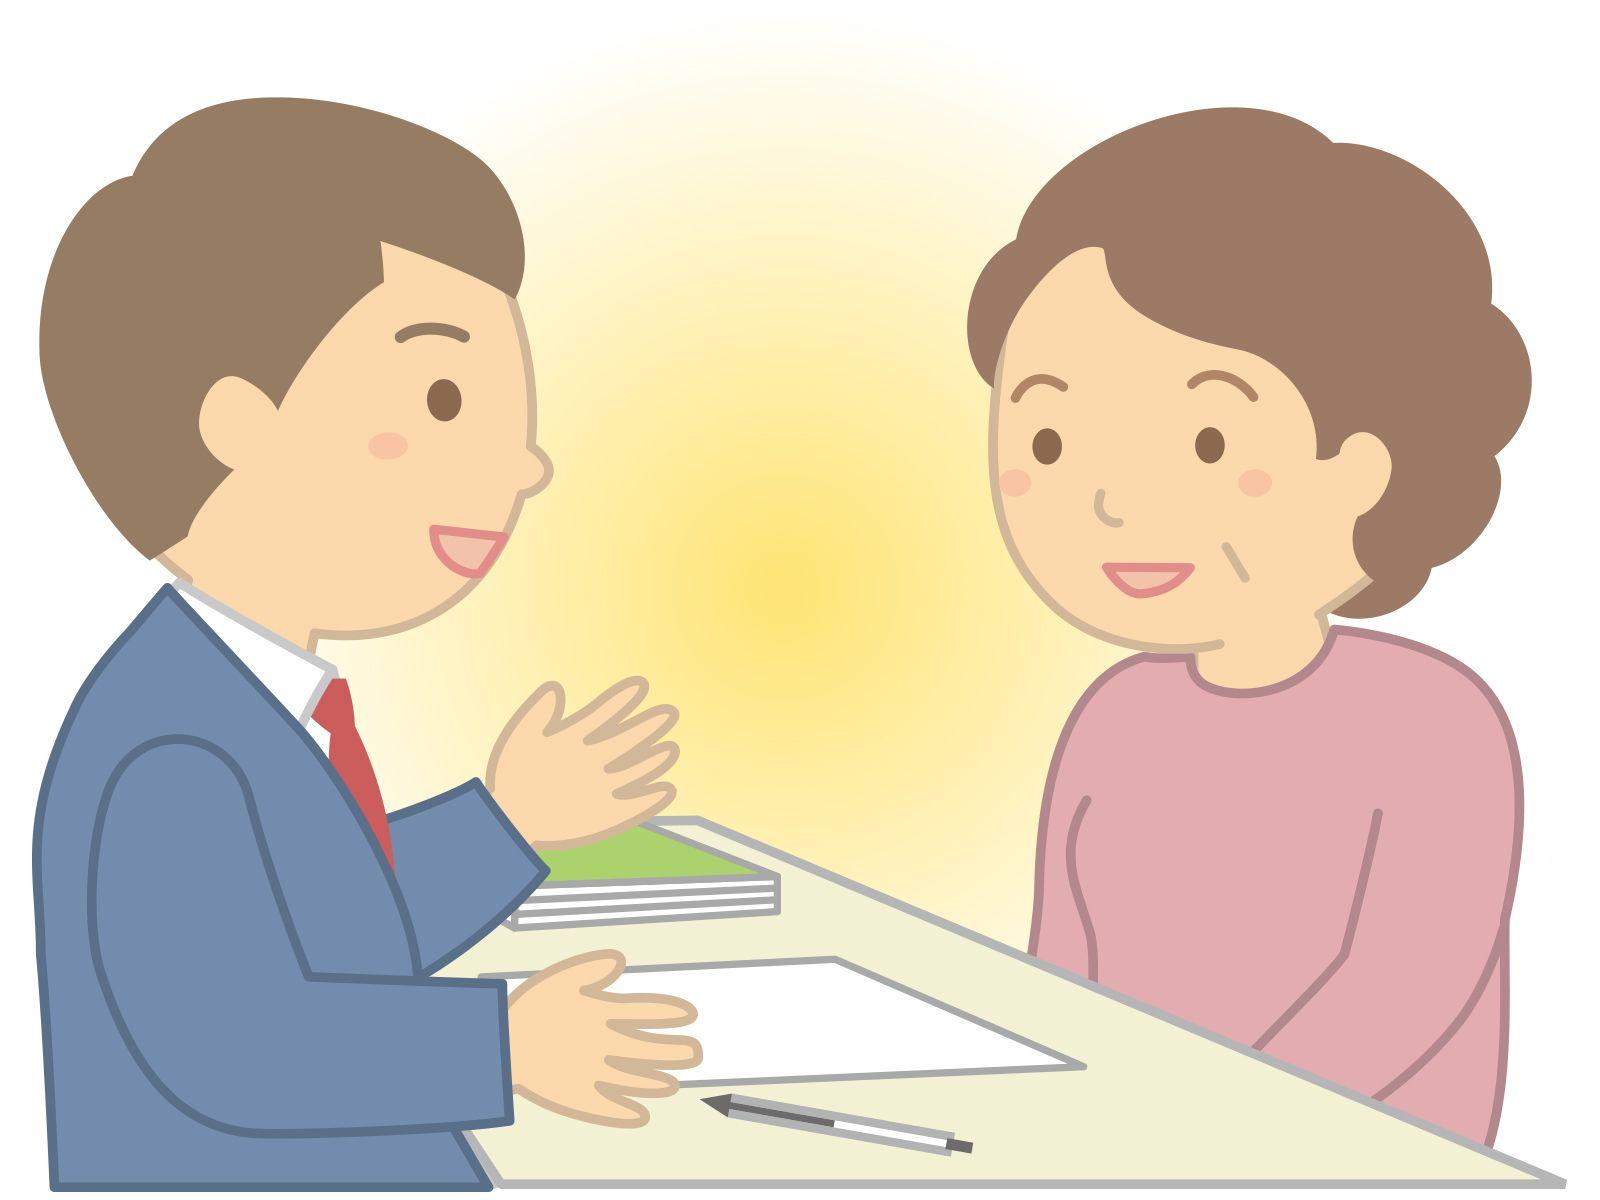 相続不動産相談、相続対策・相続不動産整理が相談できる専門不動産会社